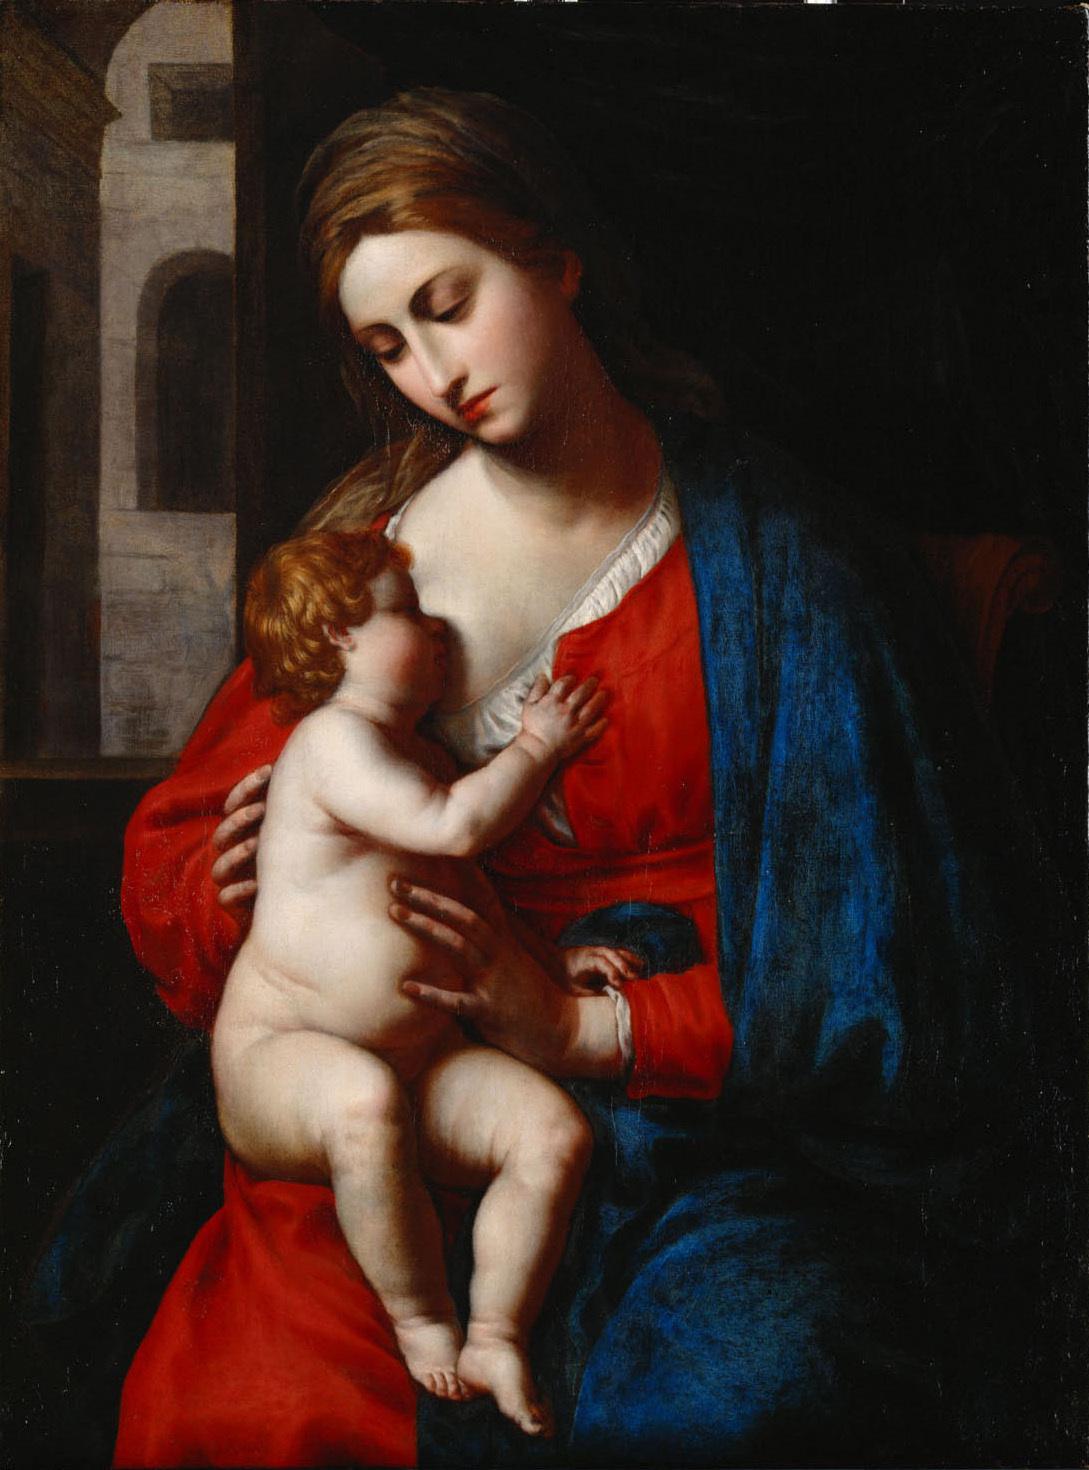 Maria mit Kind von Alessandro Turchi, gen. L'Orbetto